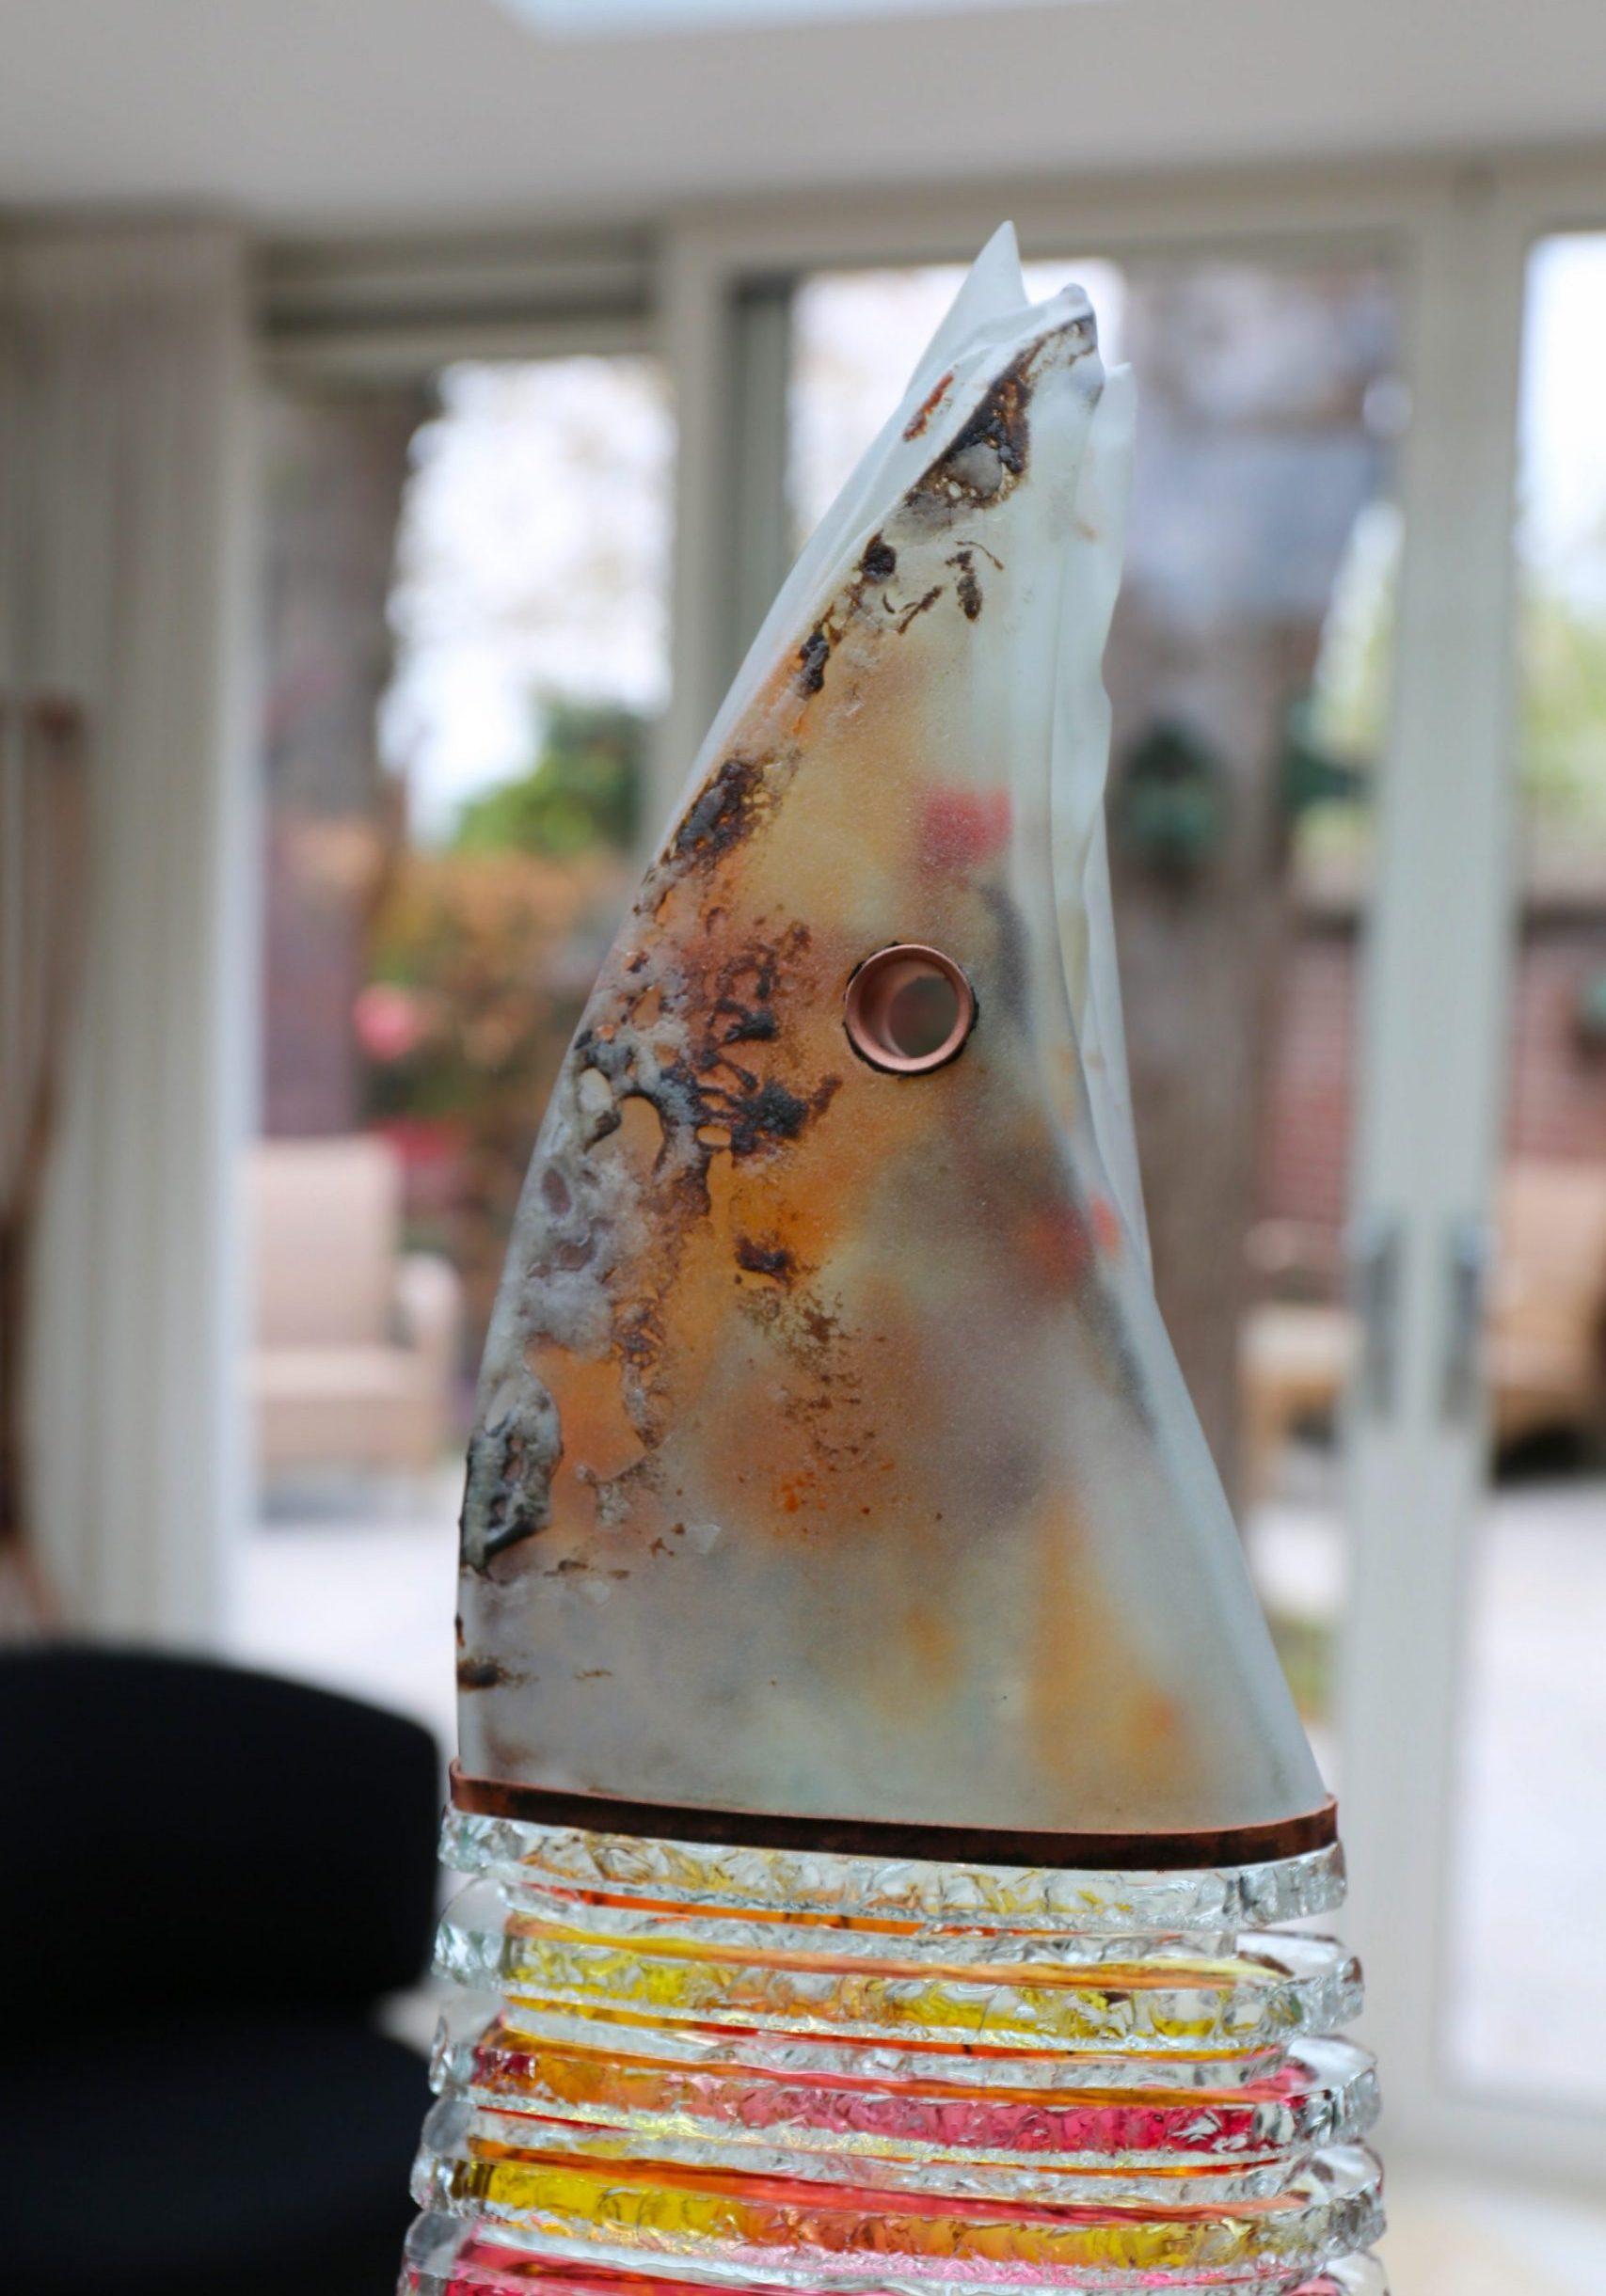 Sunlight controller 59x18x13 cm glas brons SJAAK SMETSERS sfeerfoto2